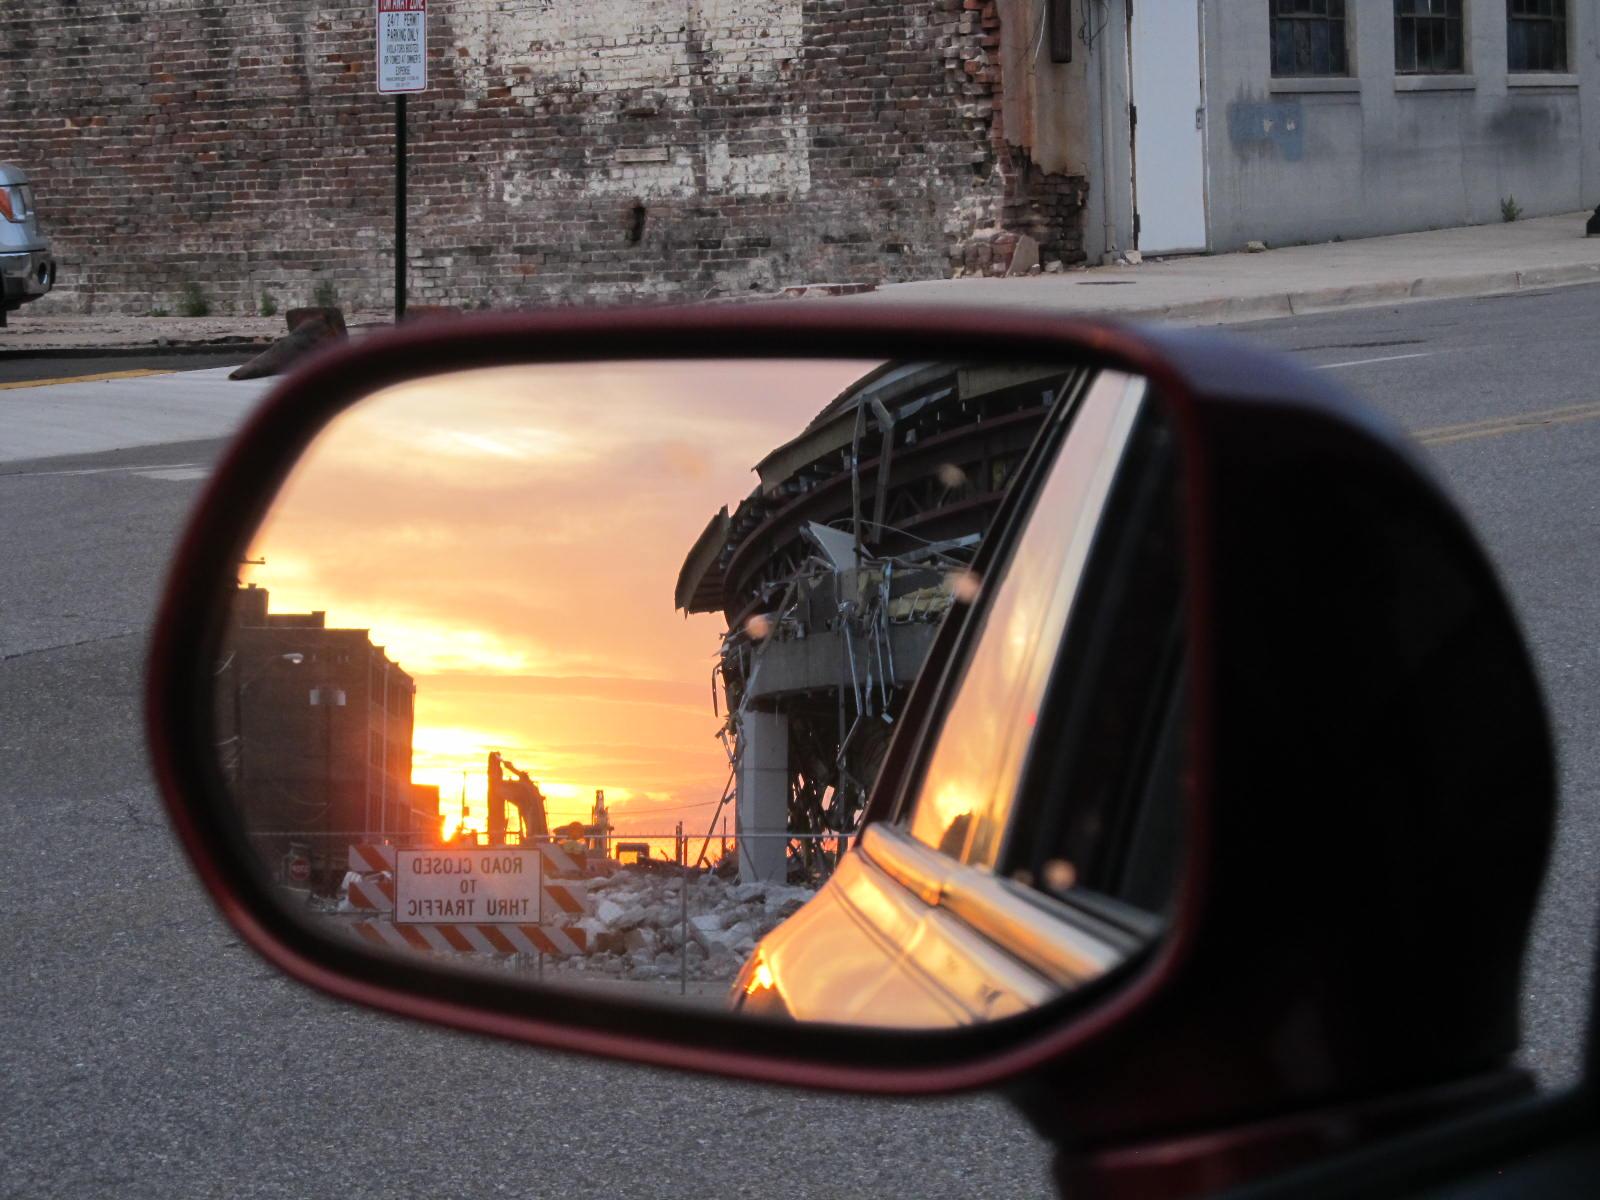 Deconstruction in rearview mirror